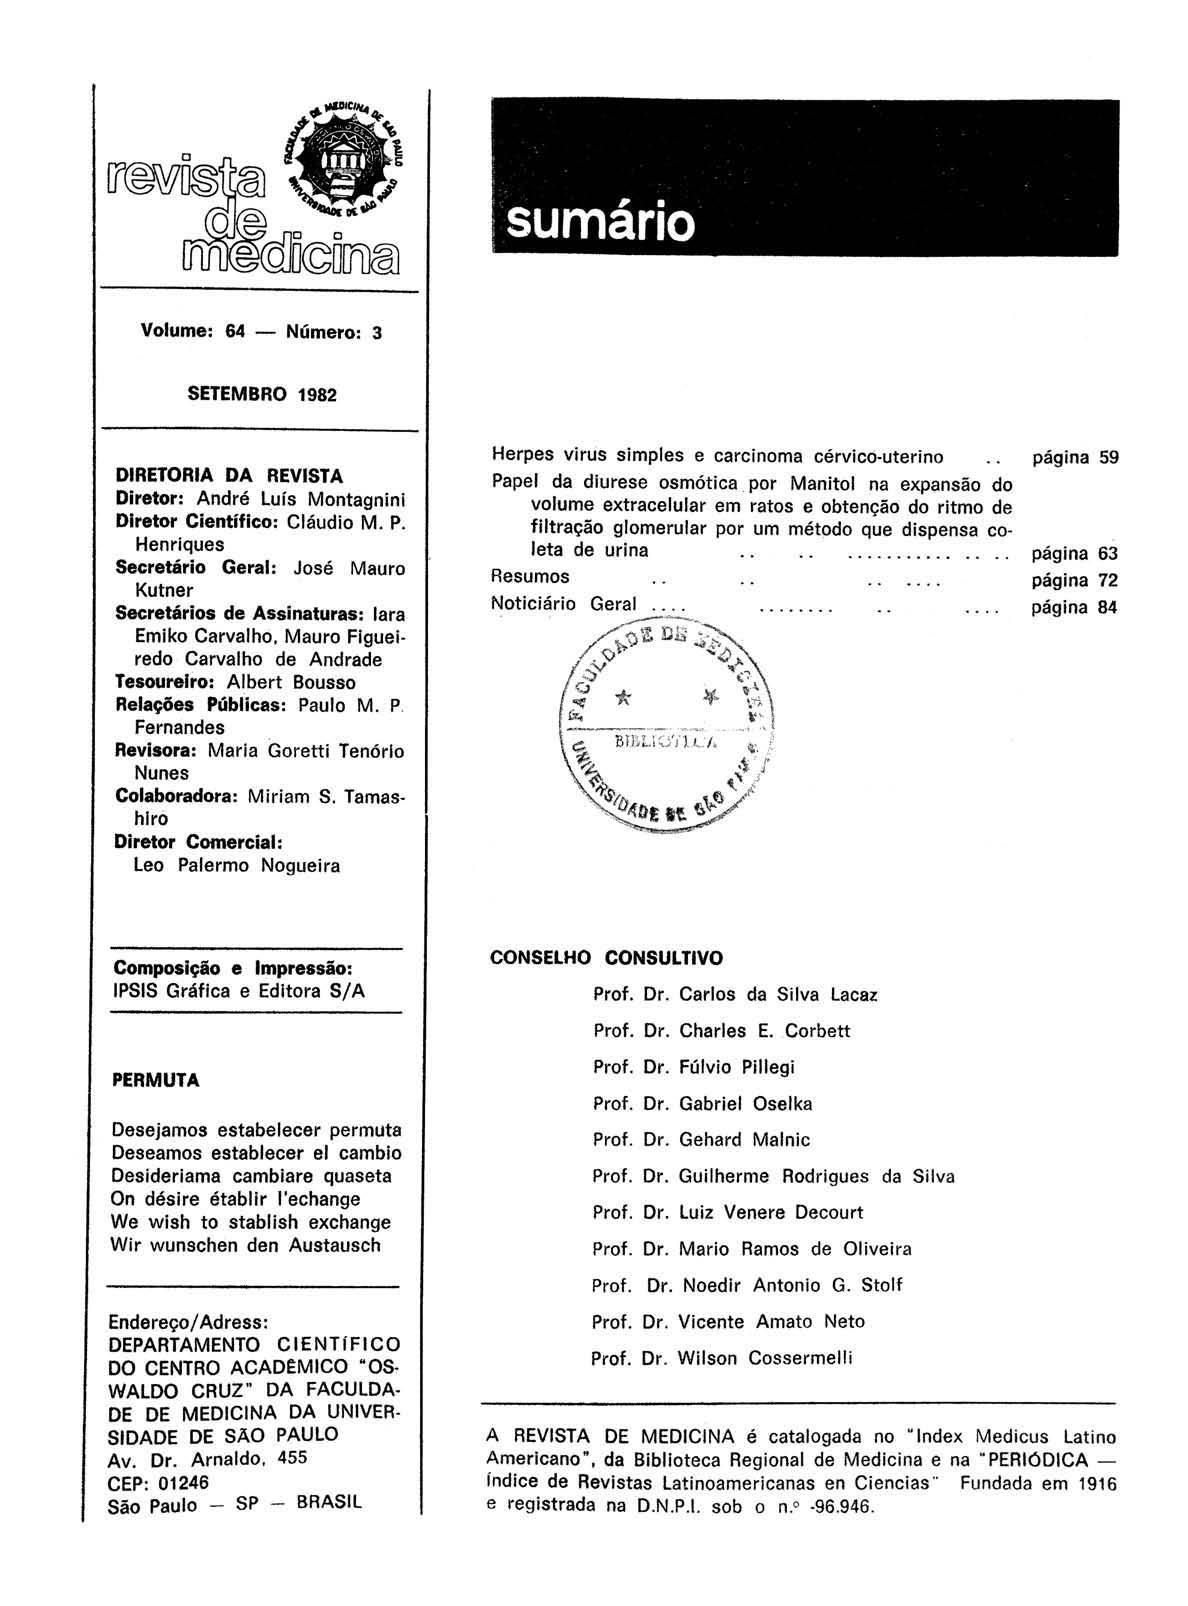 Visualizar v. 64 n. 3 (1982)